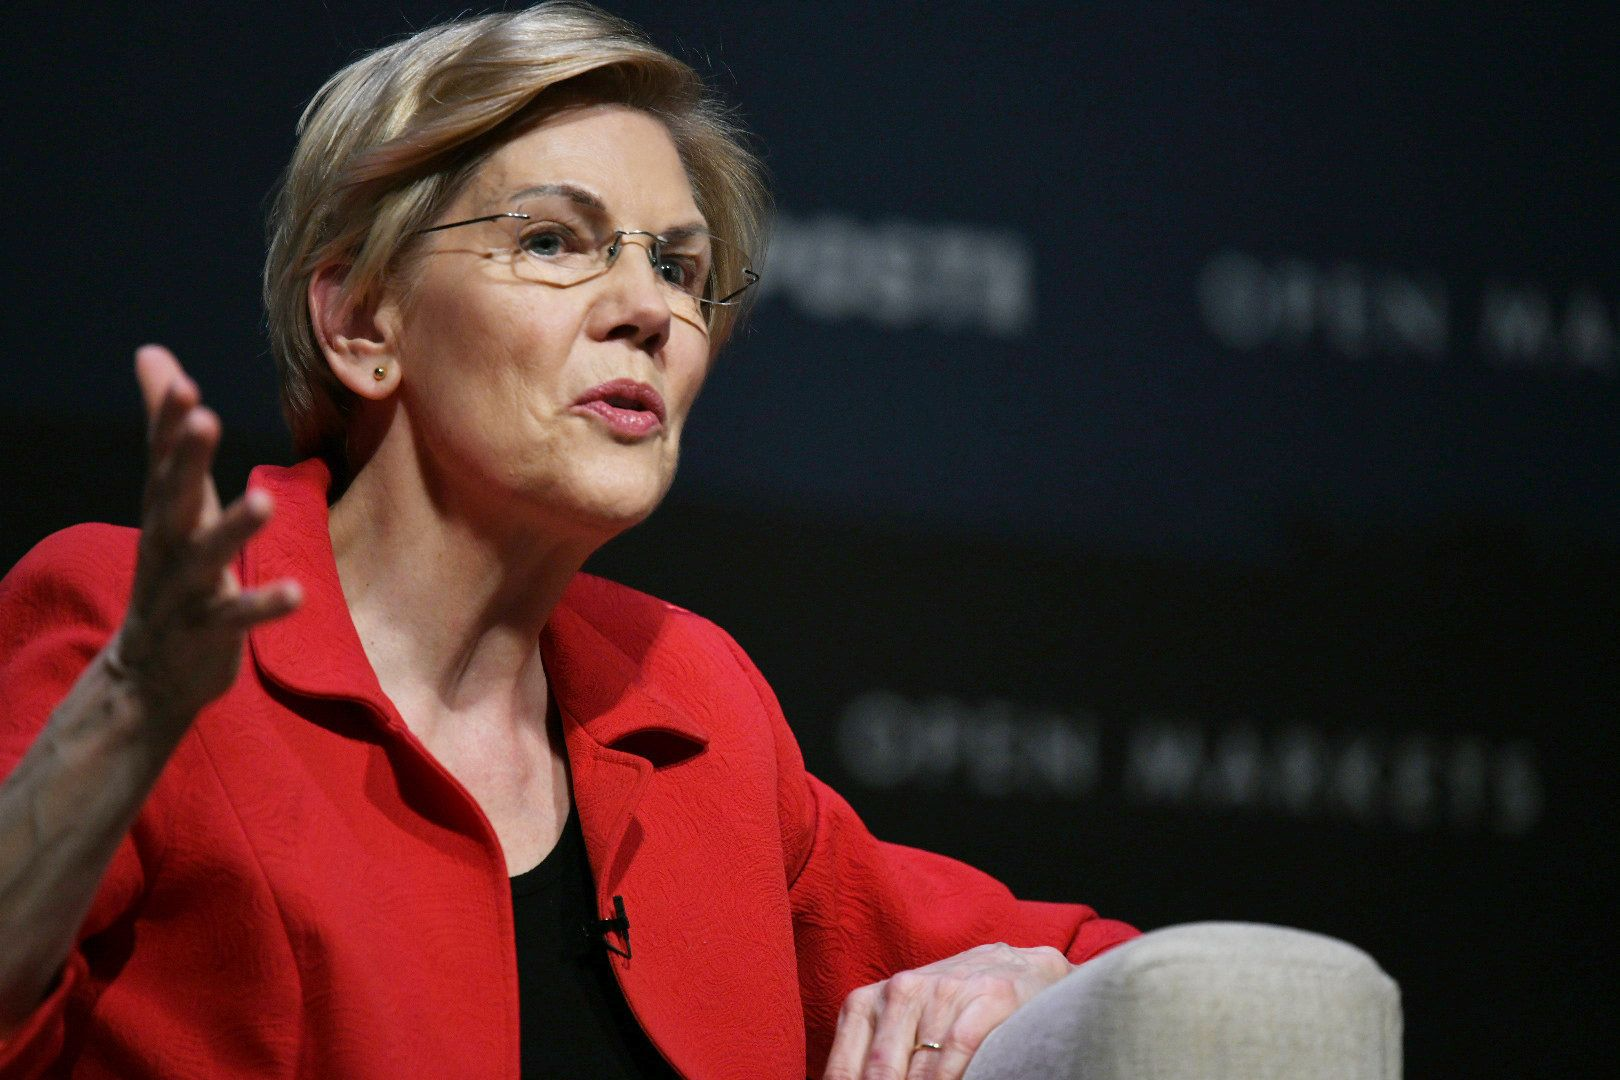 Sen. Elizabeth Warren at Heartland Forum of Democratic presidential candidates in Storm Lake, Iowa, on Saturday, March 30, 2019.